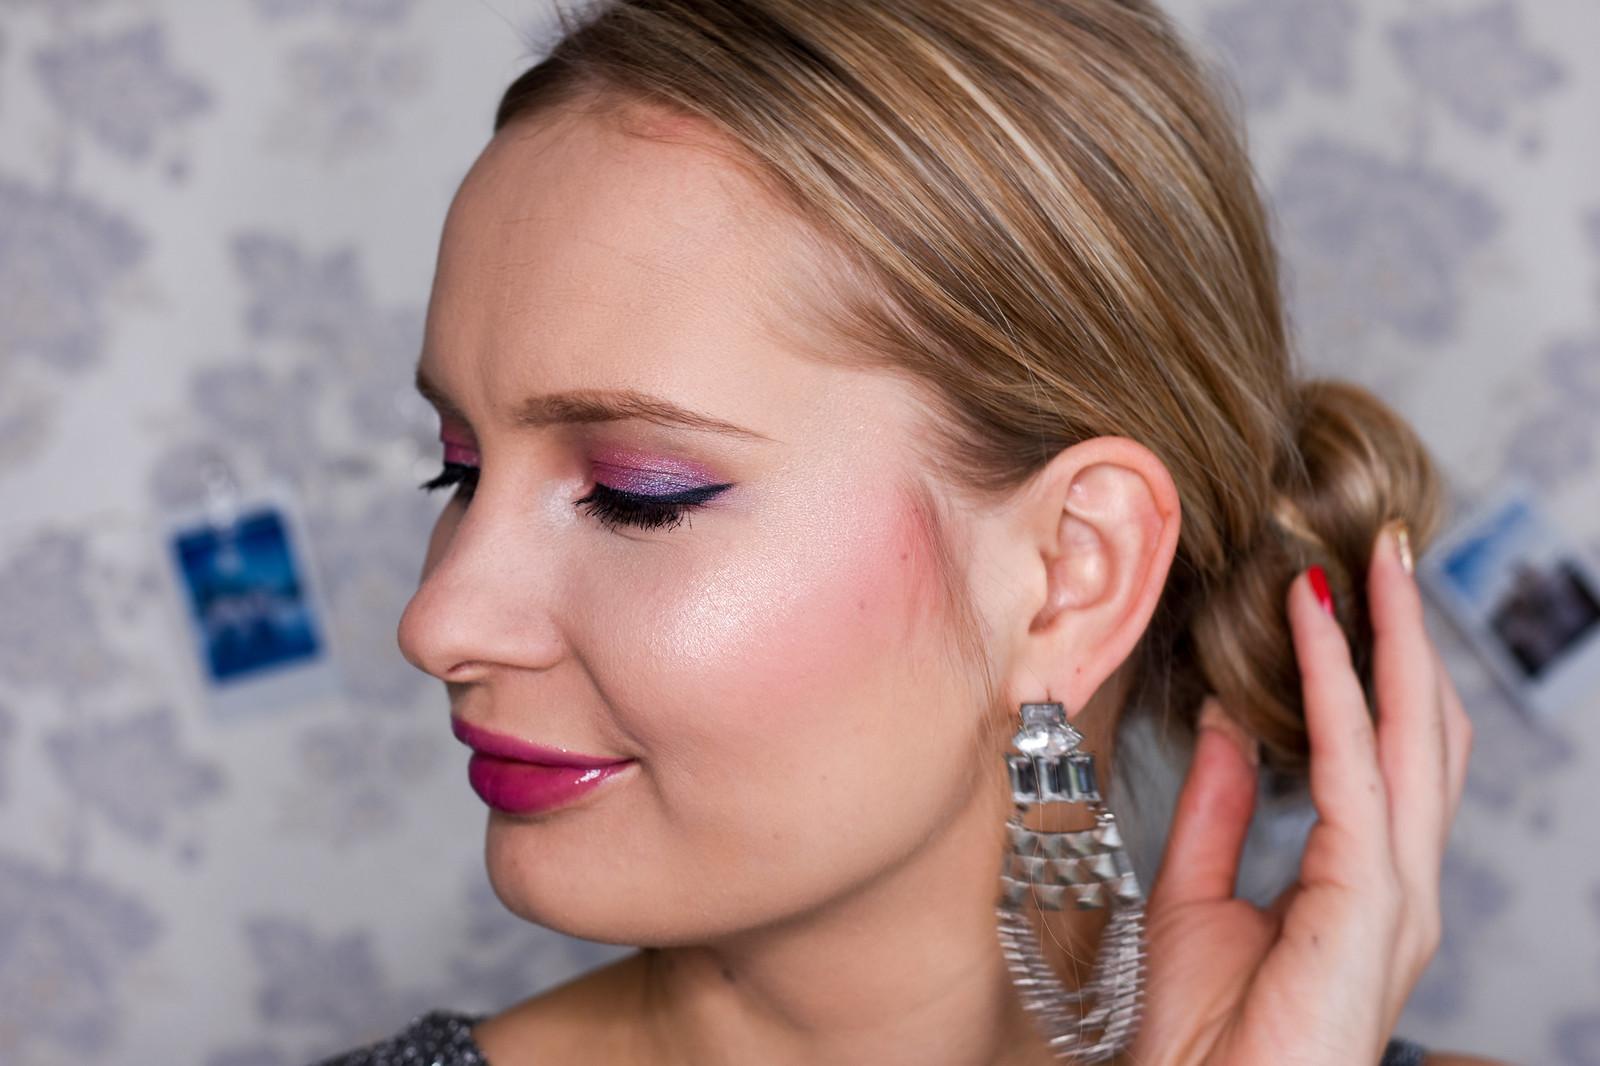 Soft and feminine makeup look